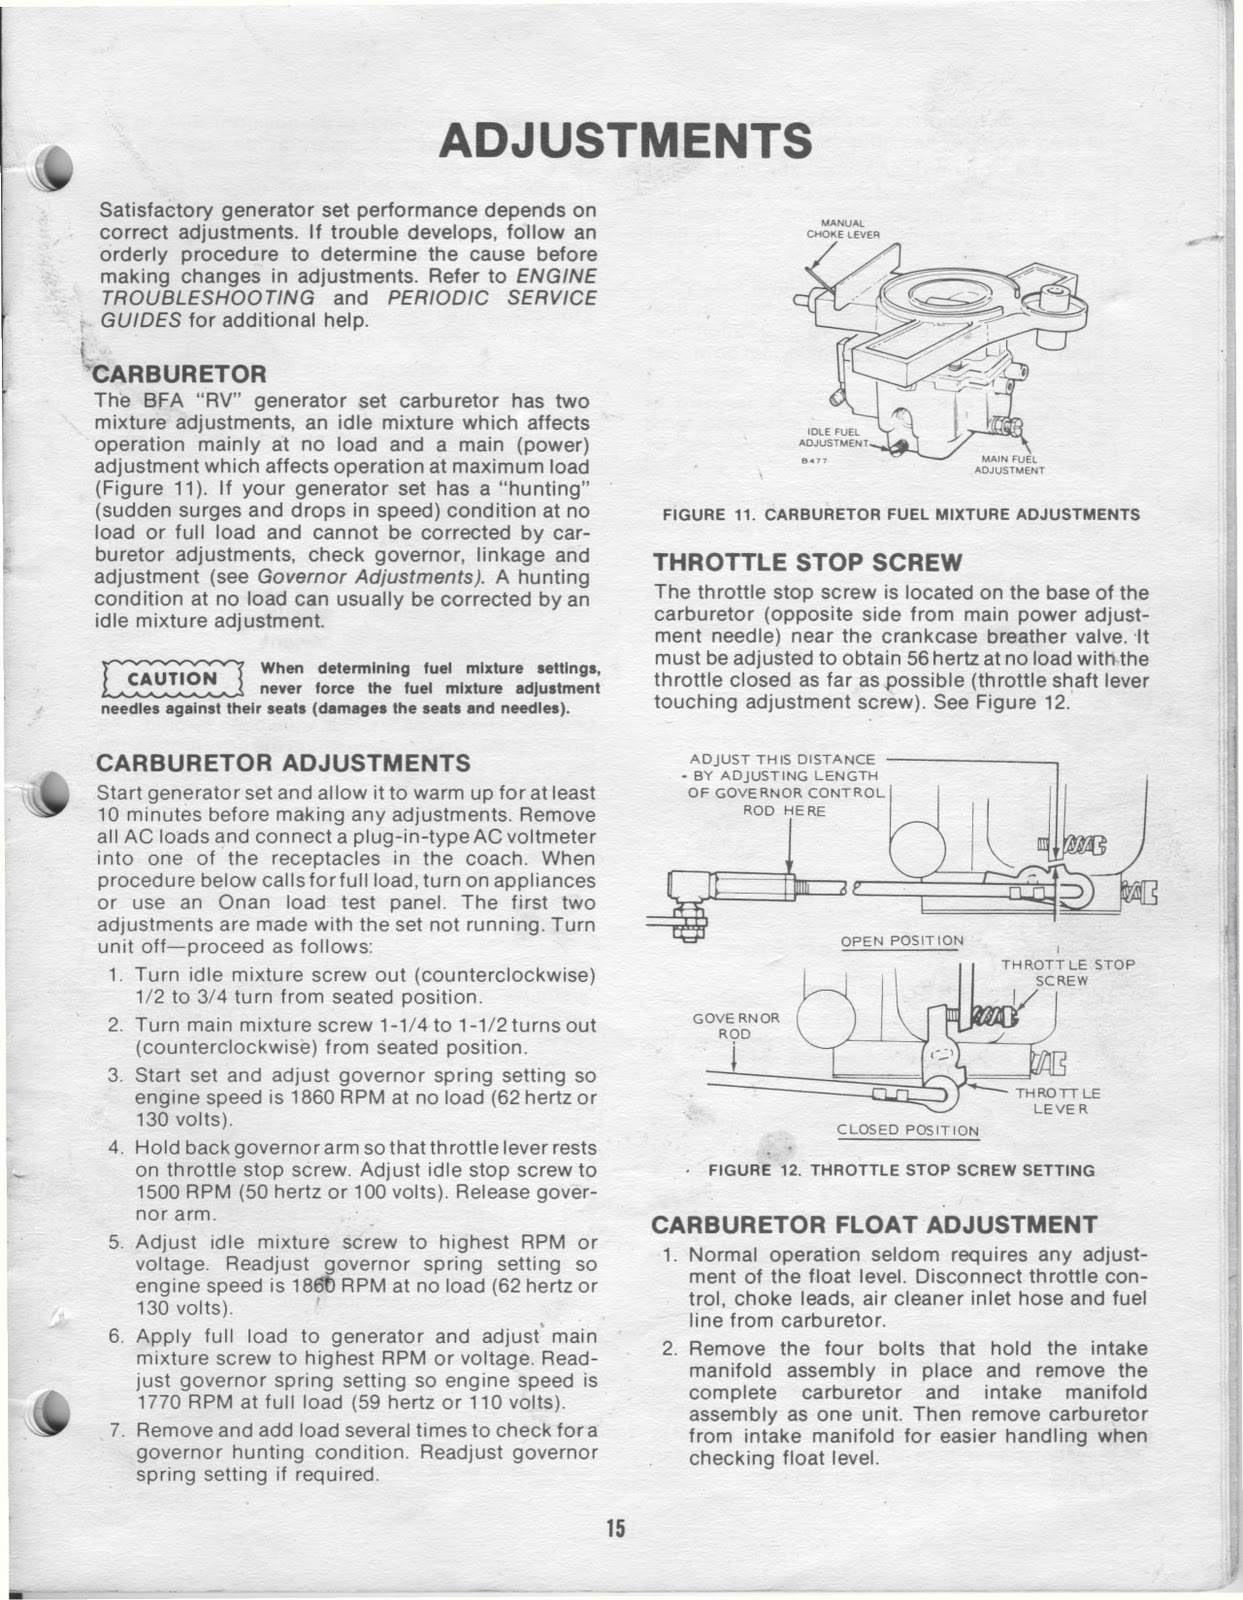 1983 Fleetwood Pace Arrow Owners Manuals: ONAN 4 0 KW BFA